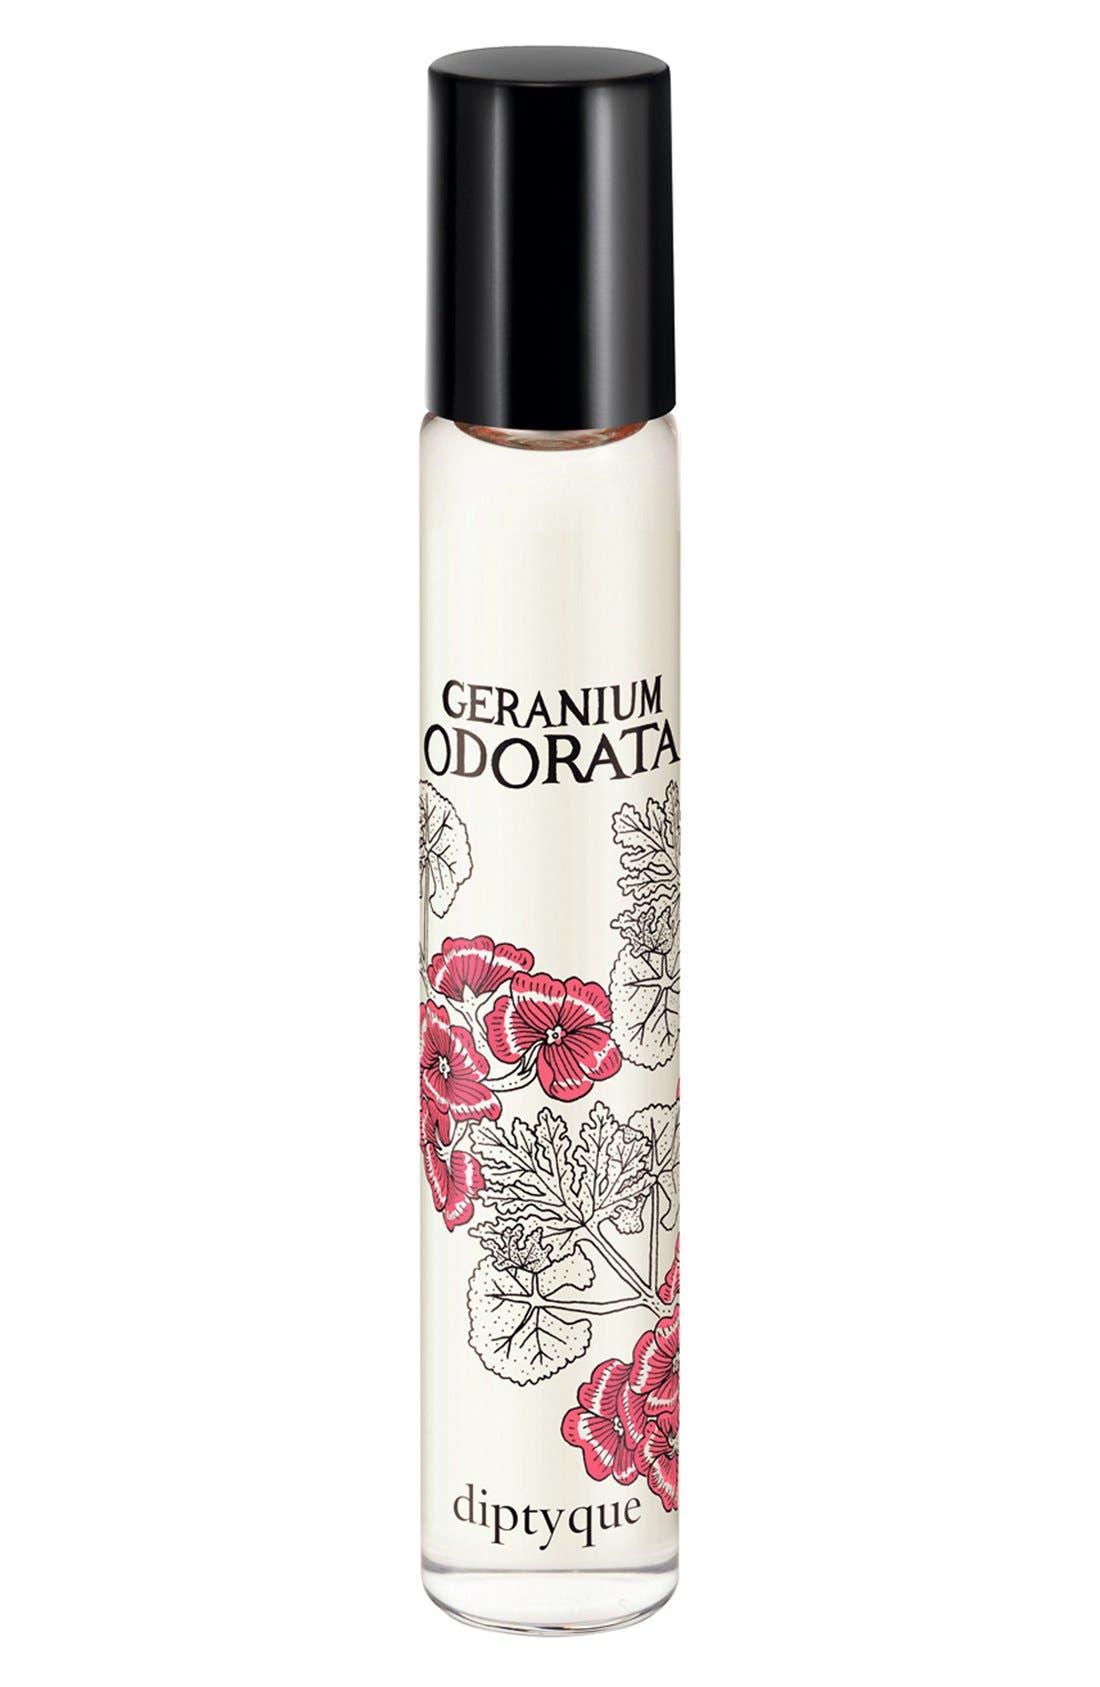 diptyque Geranium Odorata Eau de Parfum Rollerball